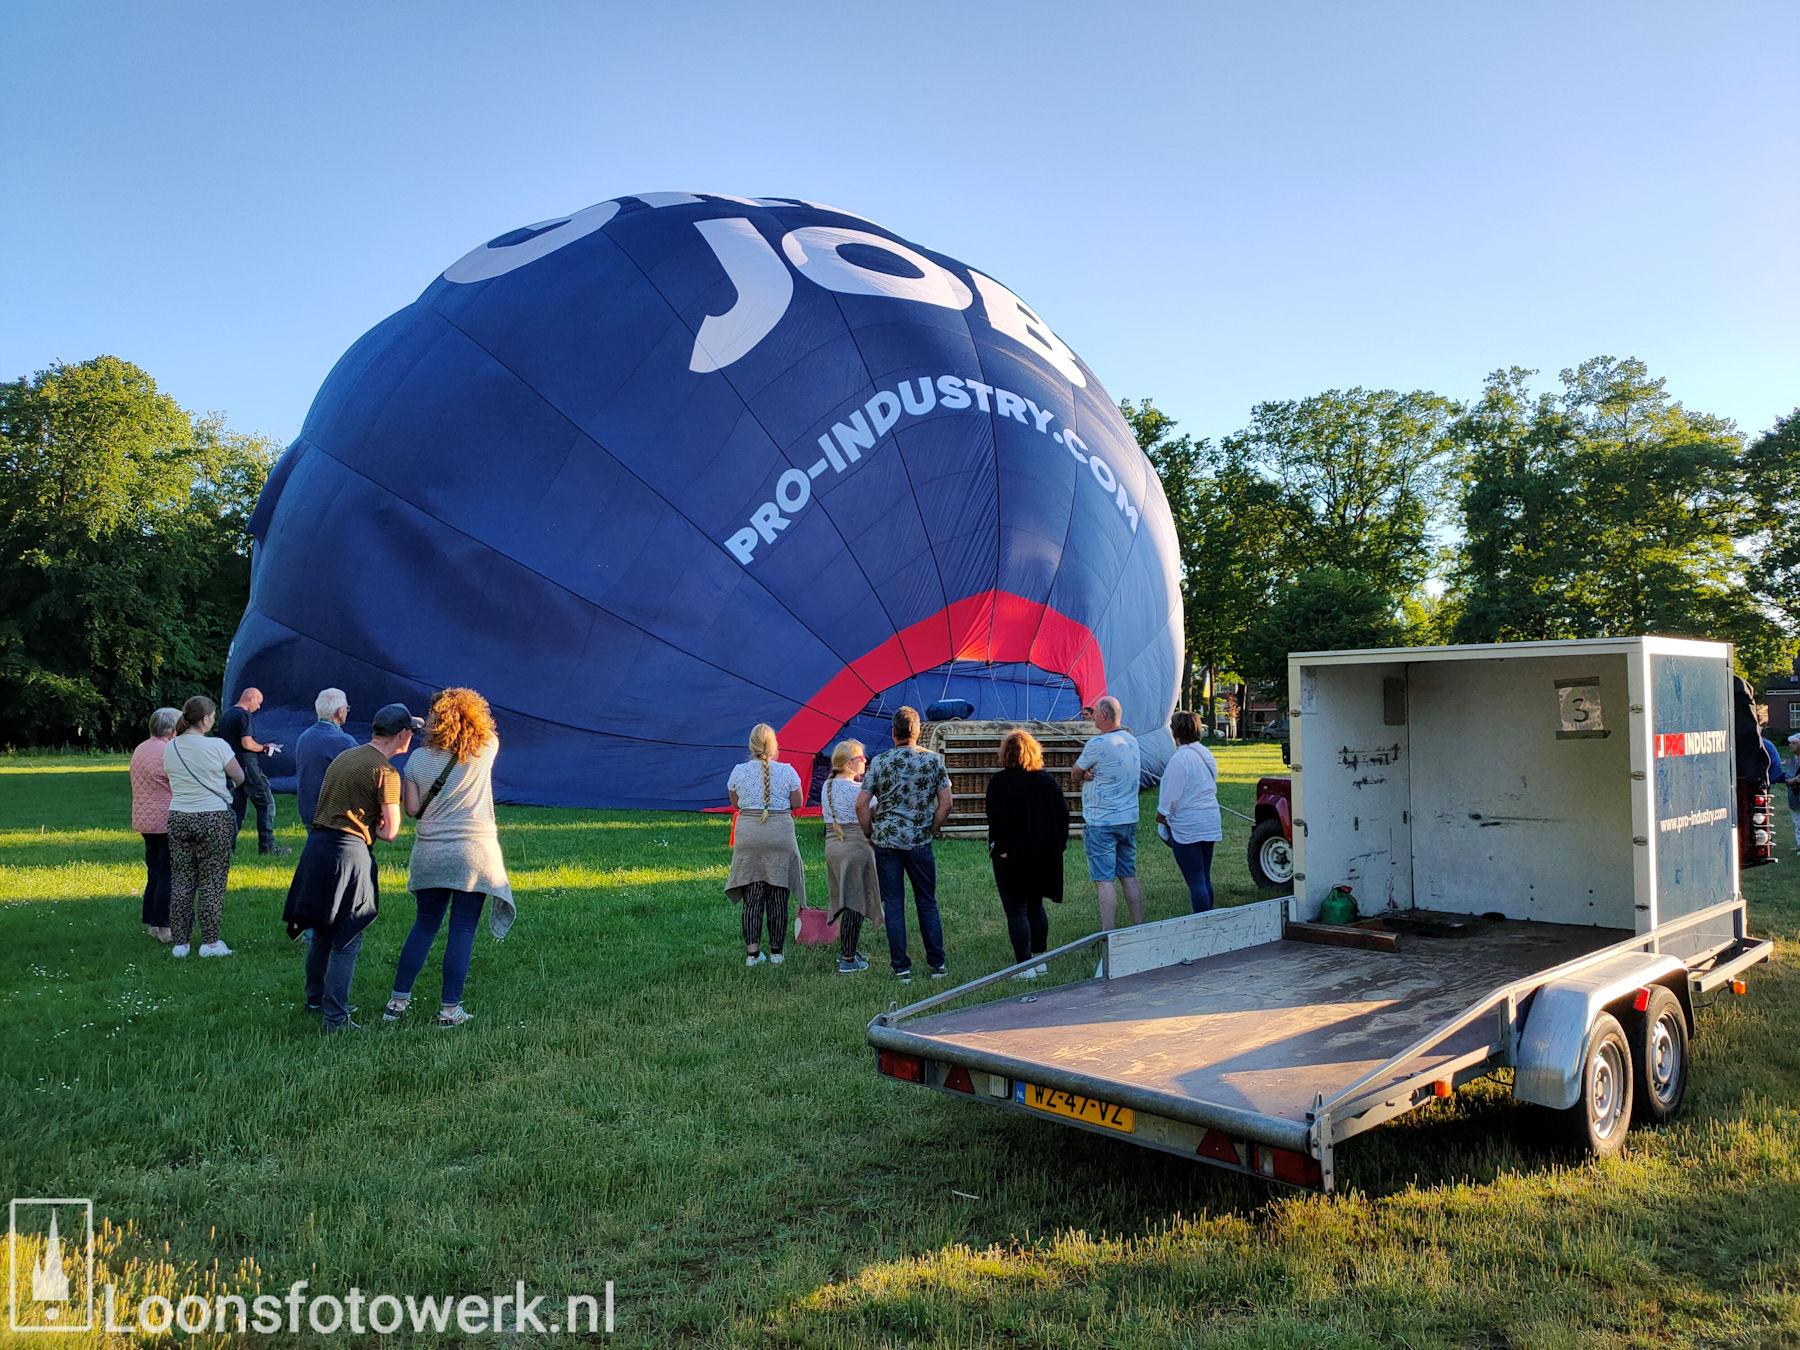 Ballonvaart vanaf de Kasteelweide 5